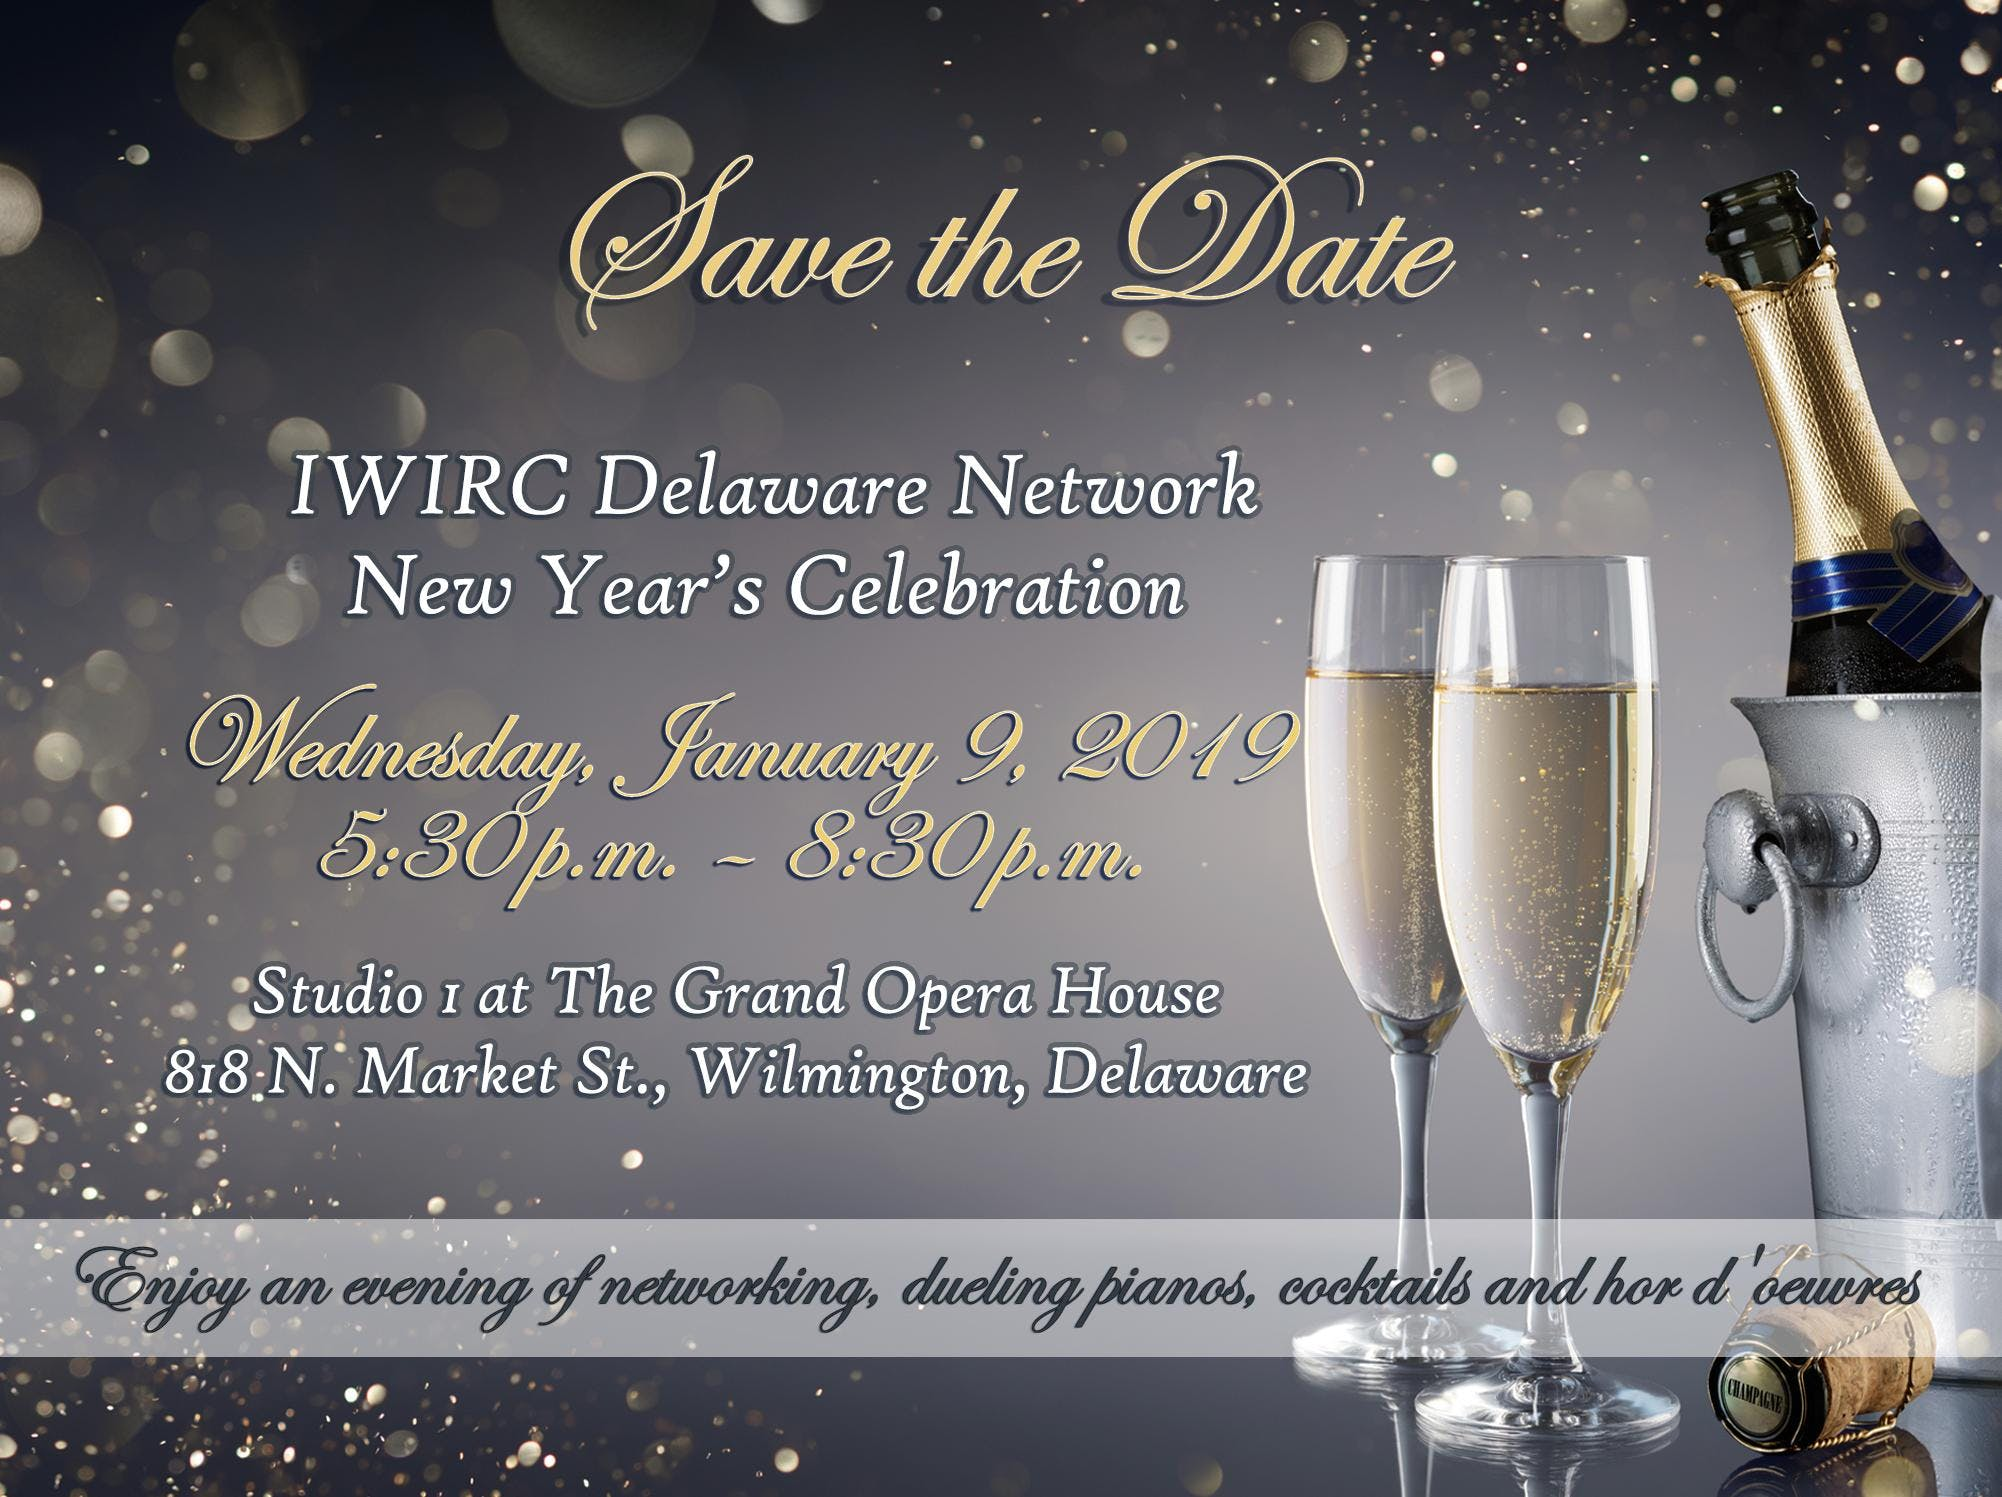 IWIRC Delaware Network New Year's Celebration - 9 JAN 2019